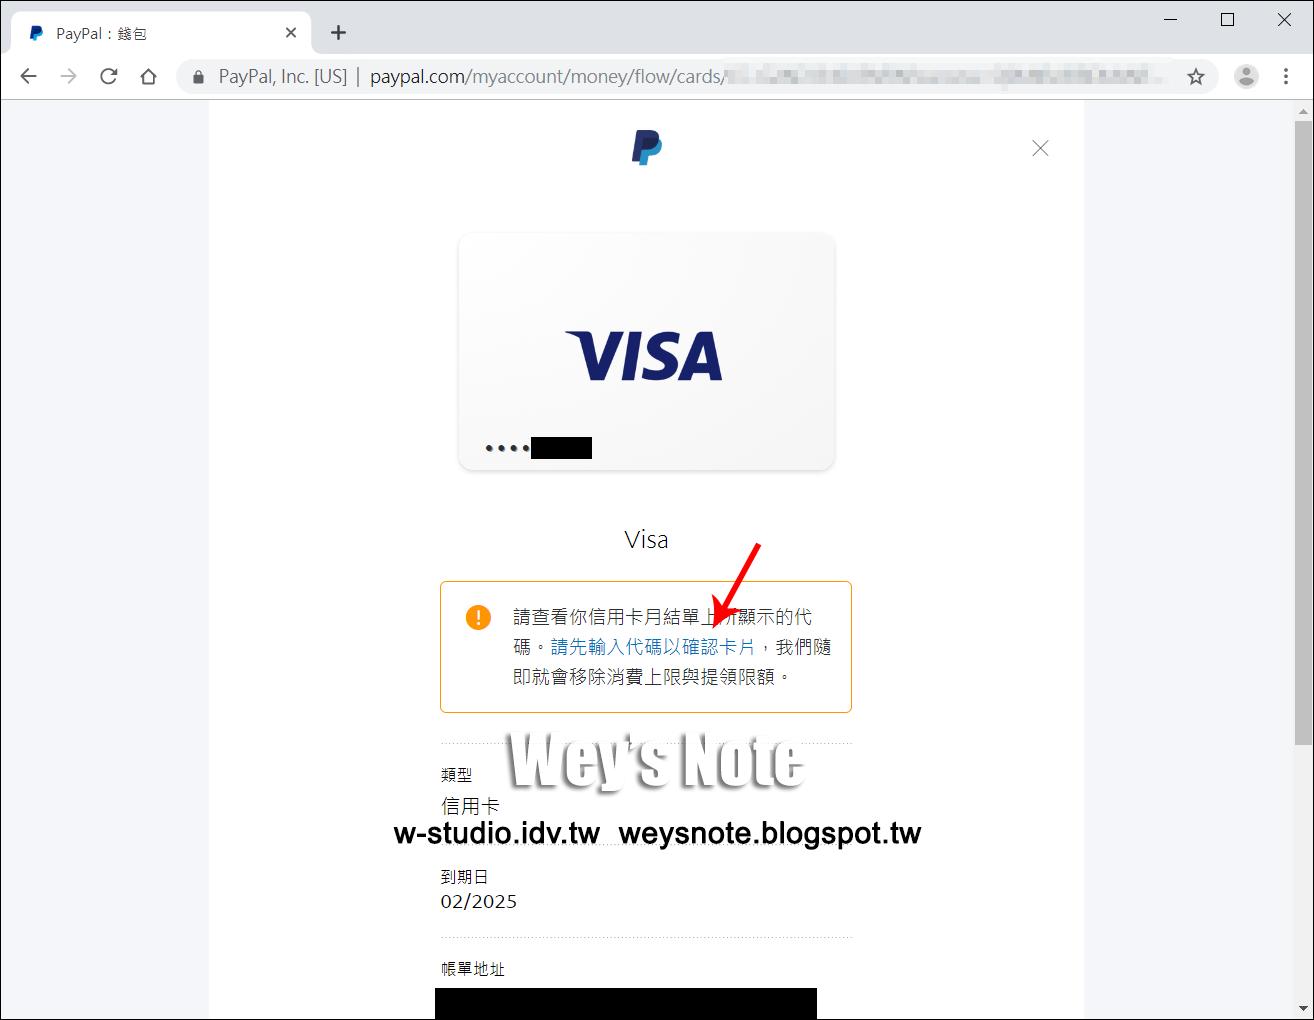 Wey's note: 如何利用 LINE Creators Market 原創市集來賺錢 - 4. PayPal 驗證身分